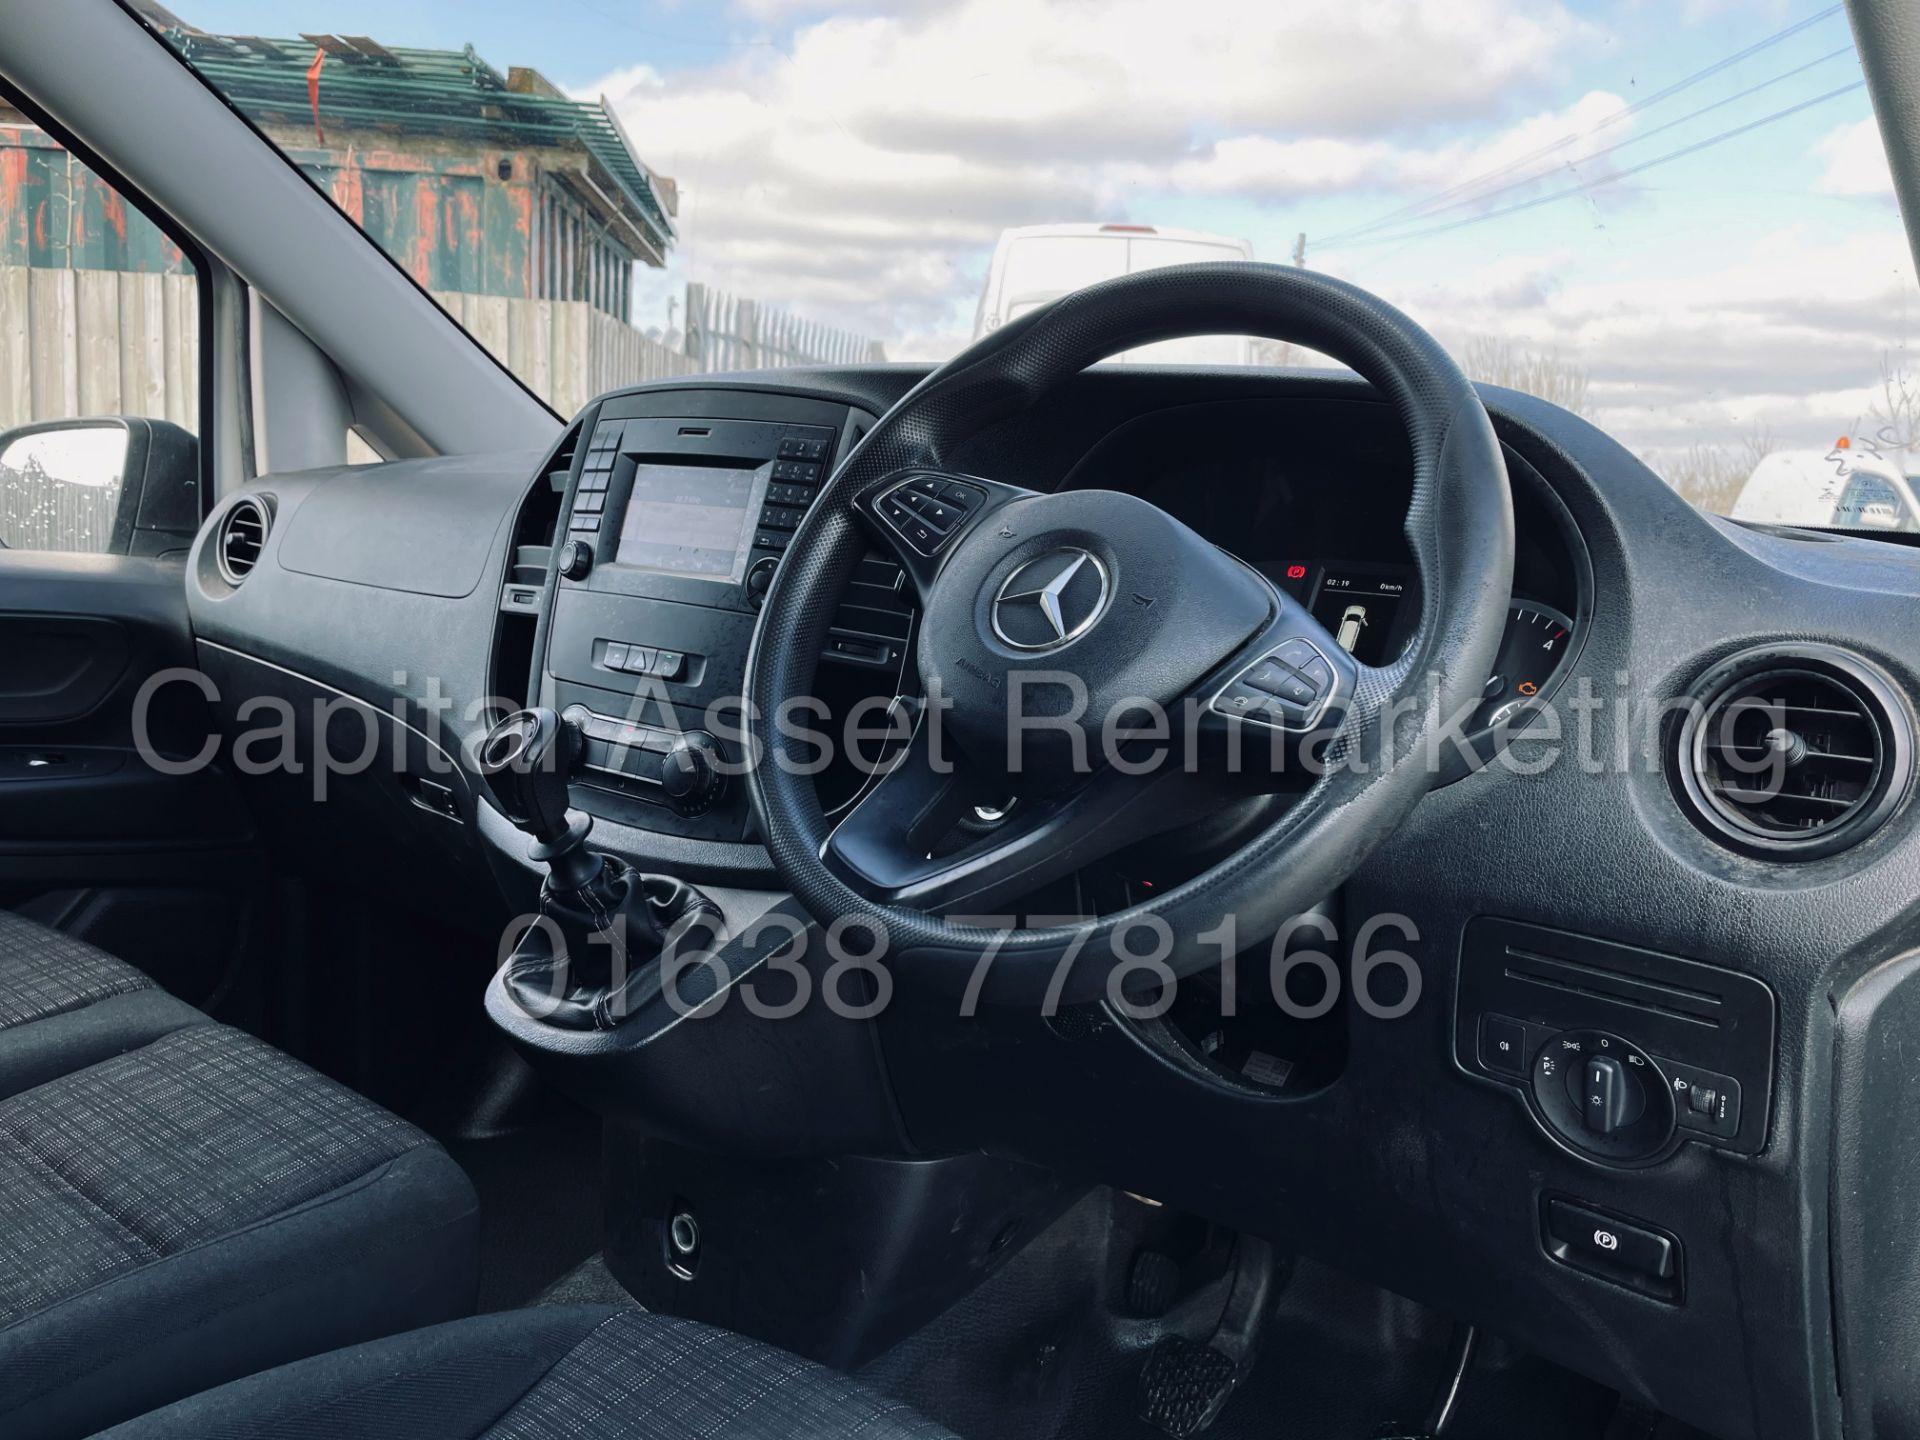 (On Sale) MERCEDES-BENZ VITO 114 *LWB -PANEL VAN* (2017 - EURO 6) '134 BHP - 6 SPEED' *65,000 MILES* - Image 24 of 34